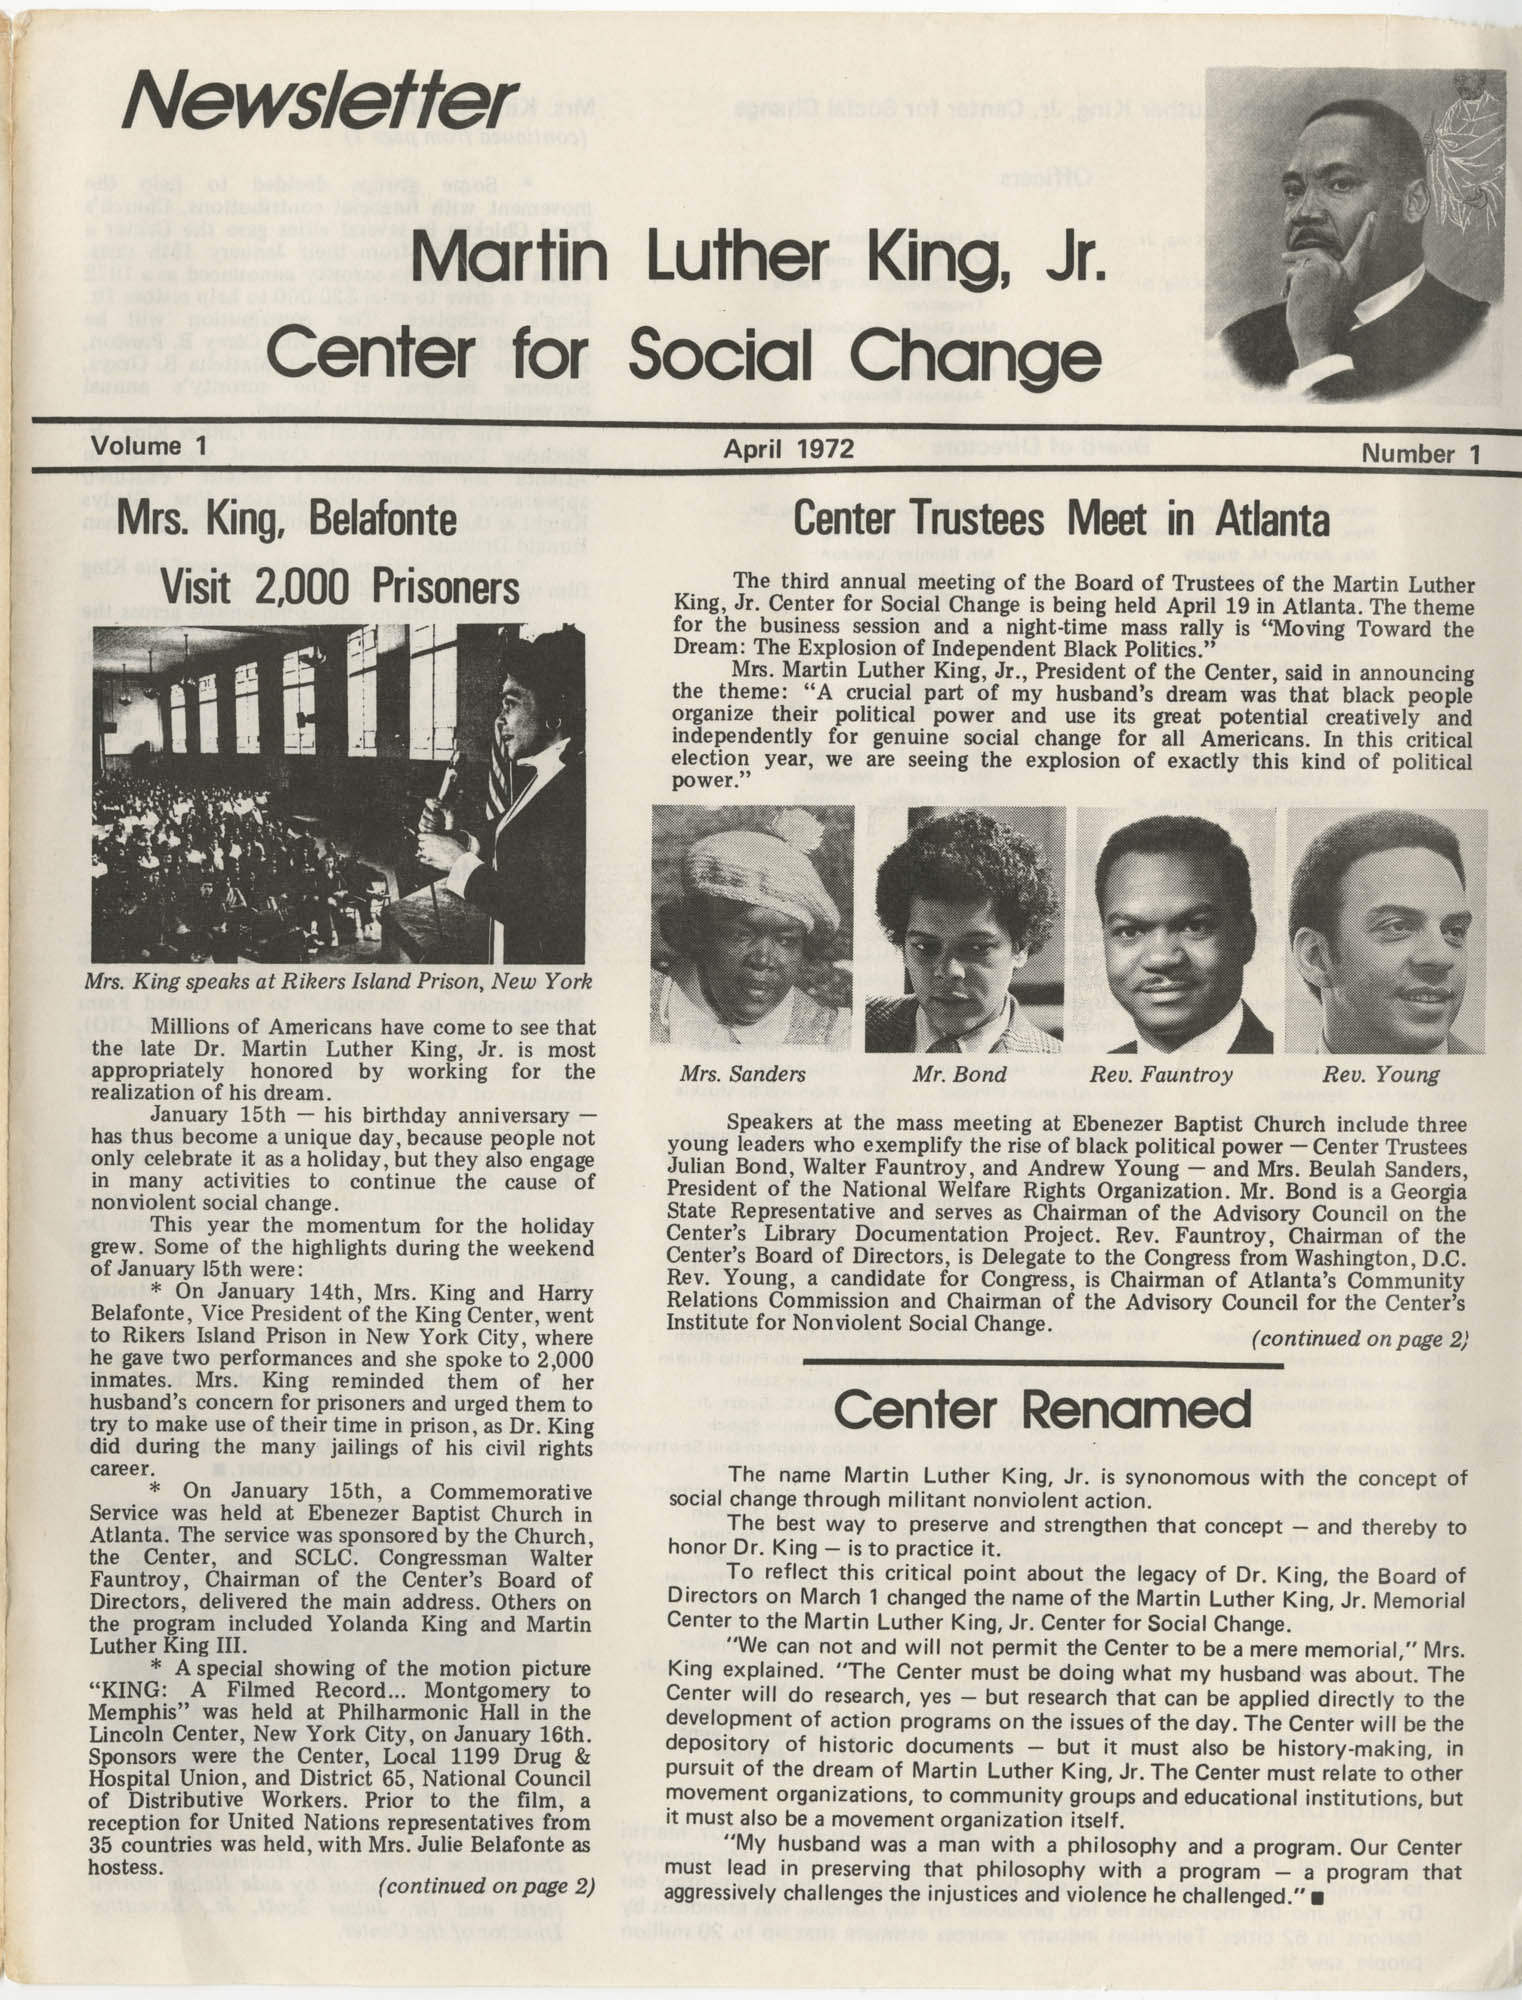 Martin Luther King, Jr. Center for Social Change Newsletter, Volume 1, Number 1